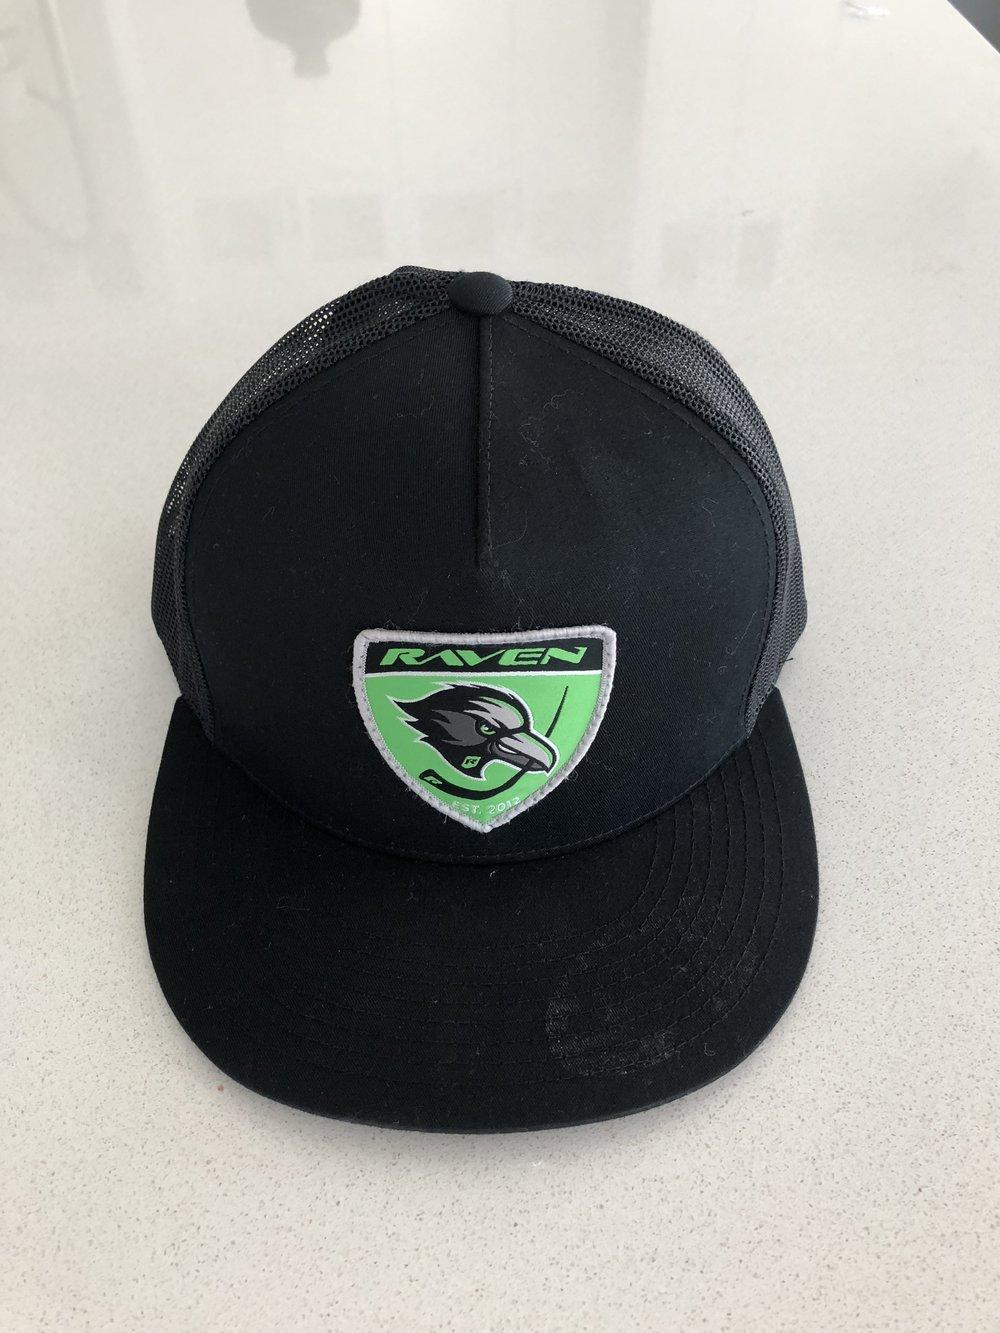 Celly Trucker hat - Black